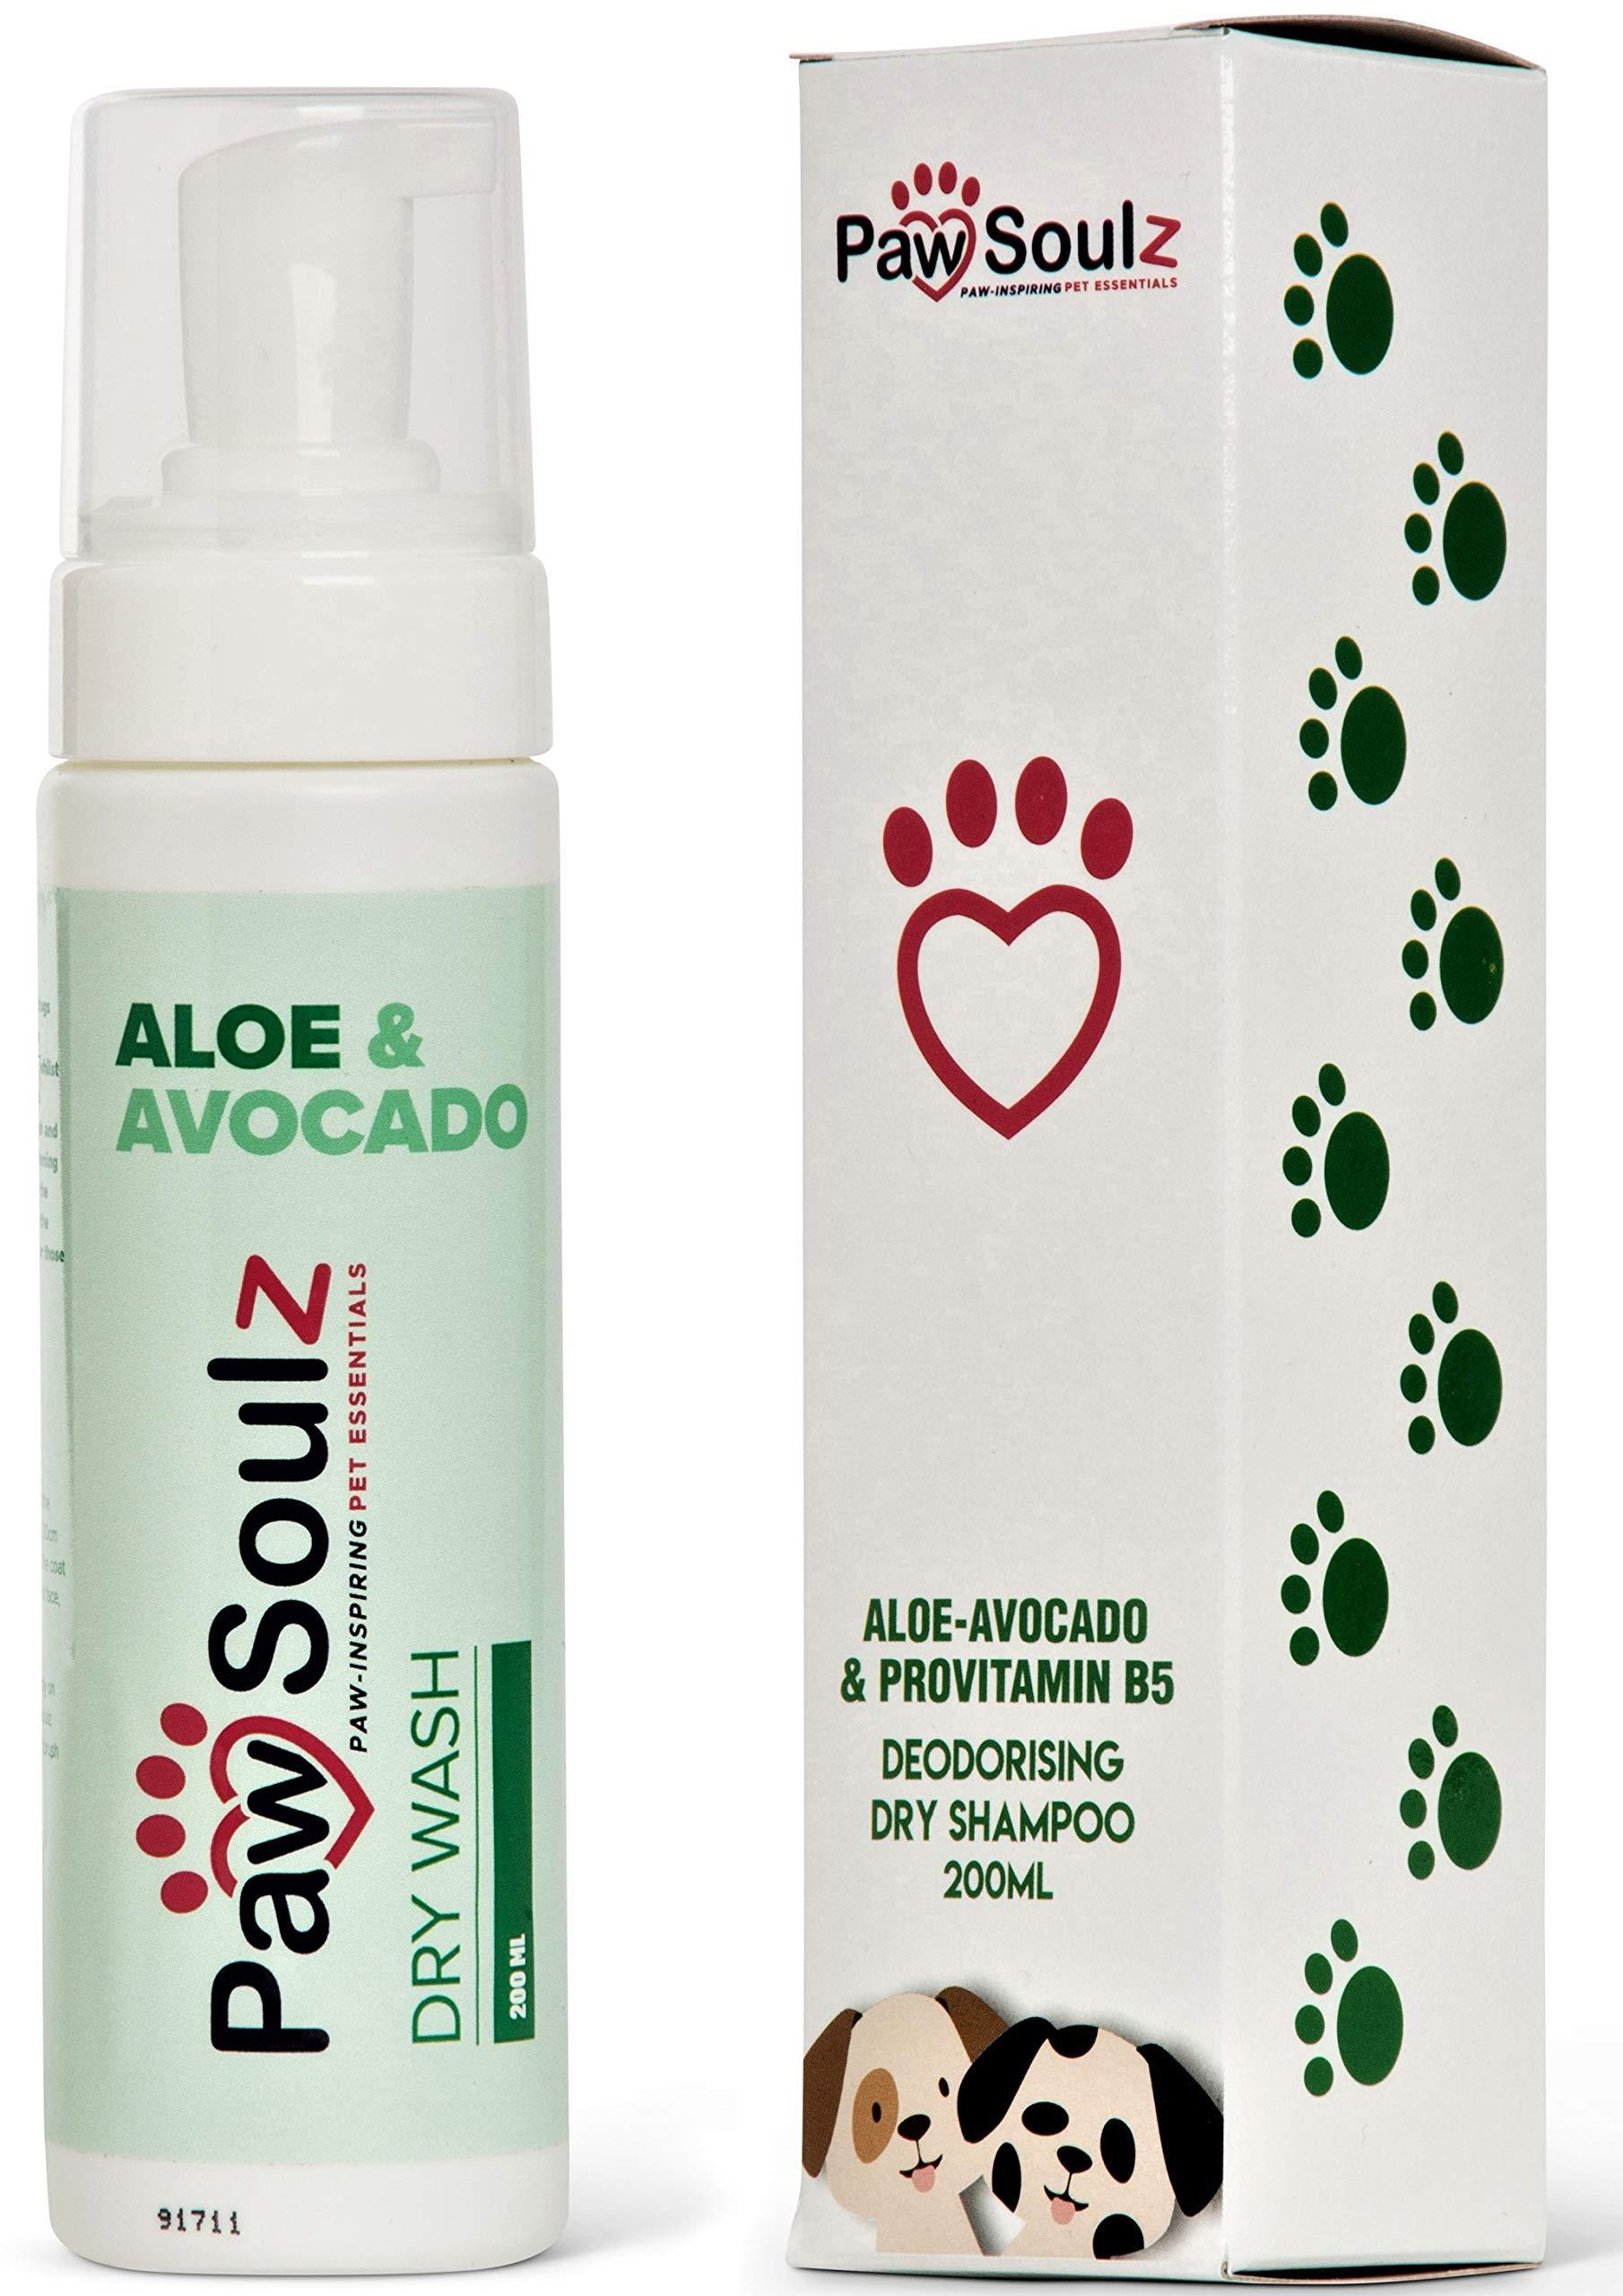 Paw Soulz – Advanced Dry Dog Shampoo – Aloe – Avocado – Provitamin B5 – Natural – Cruelty Free – Deodoriser Spray Foam…